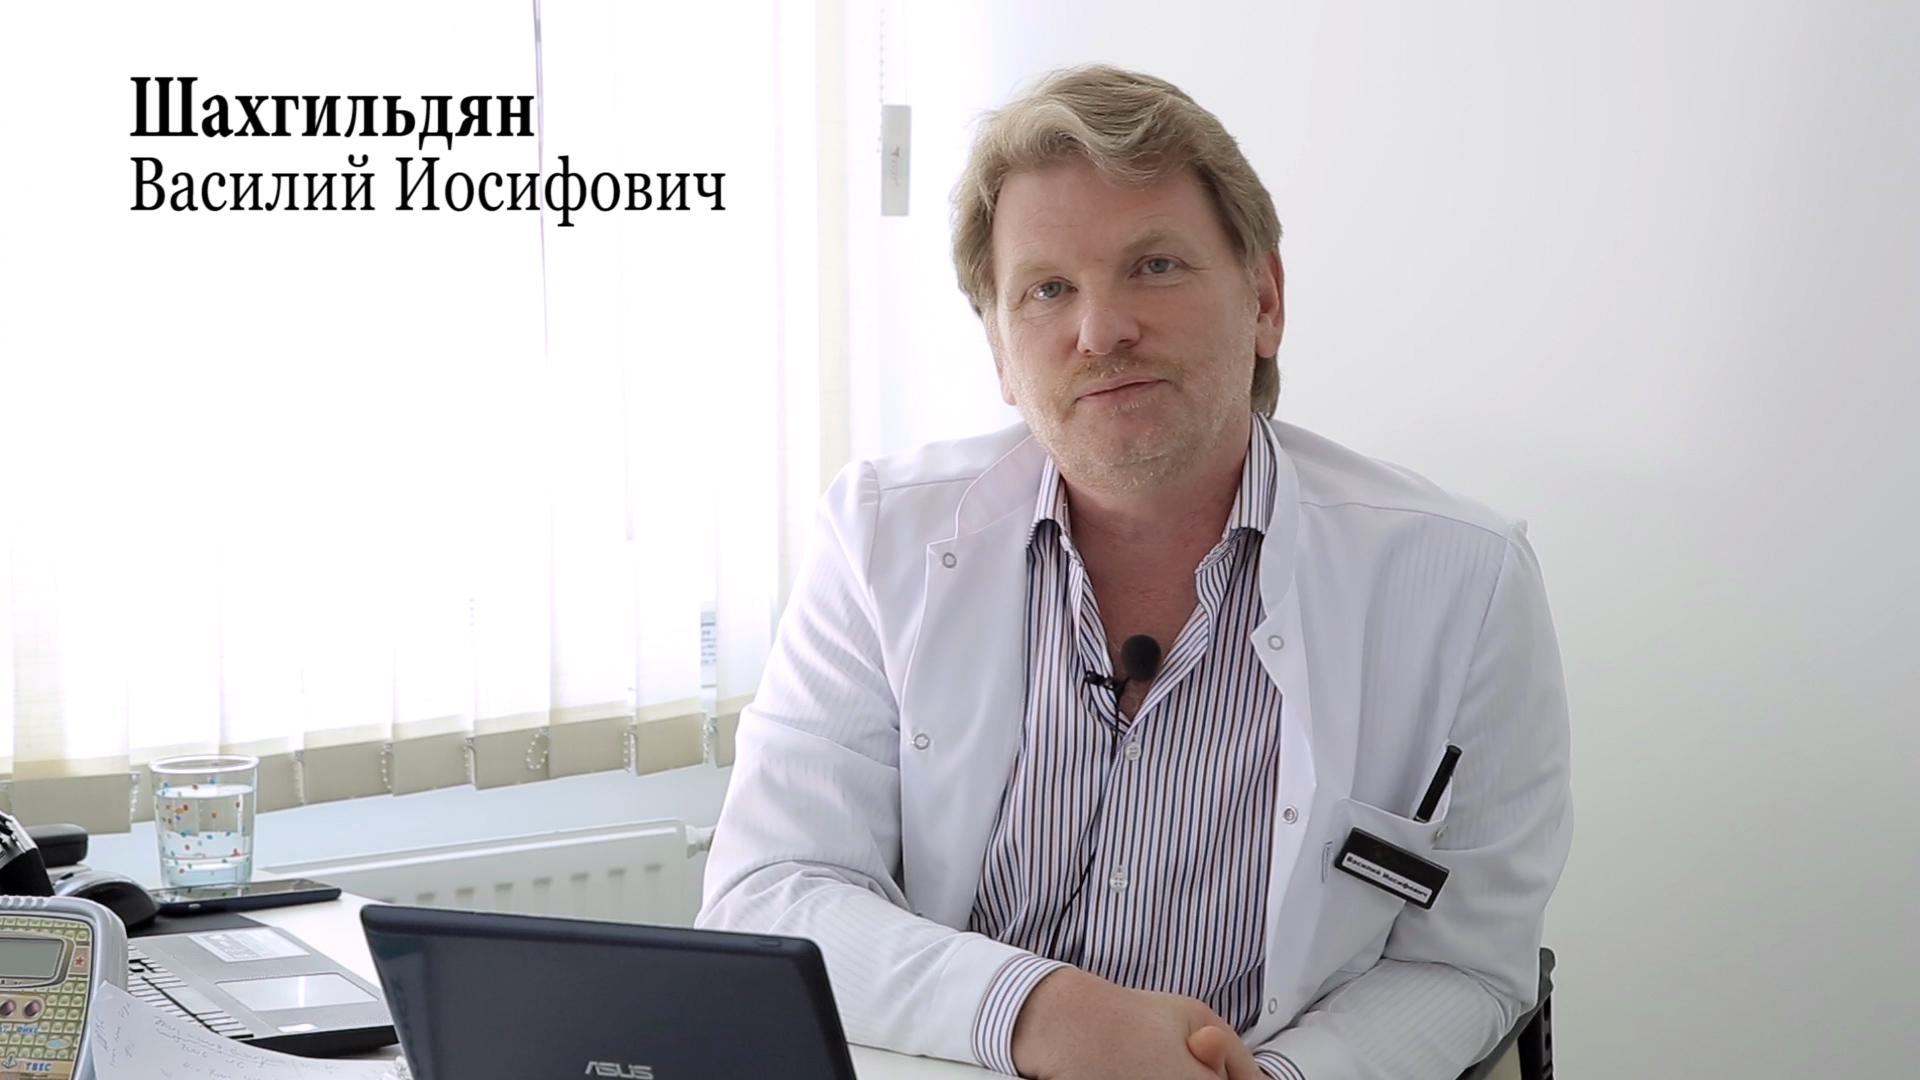 Шахгильдян Василий Иосифович